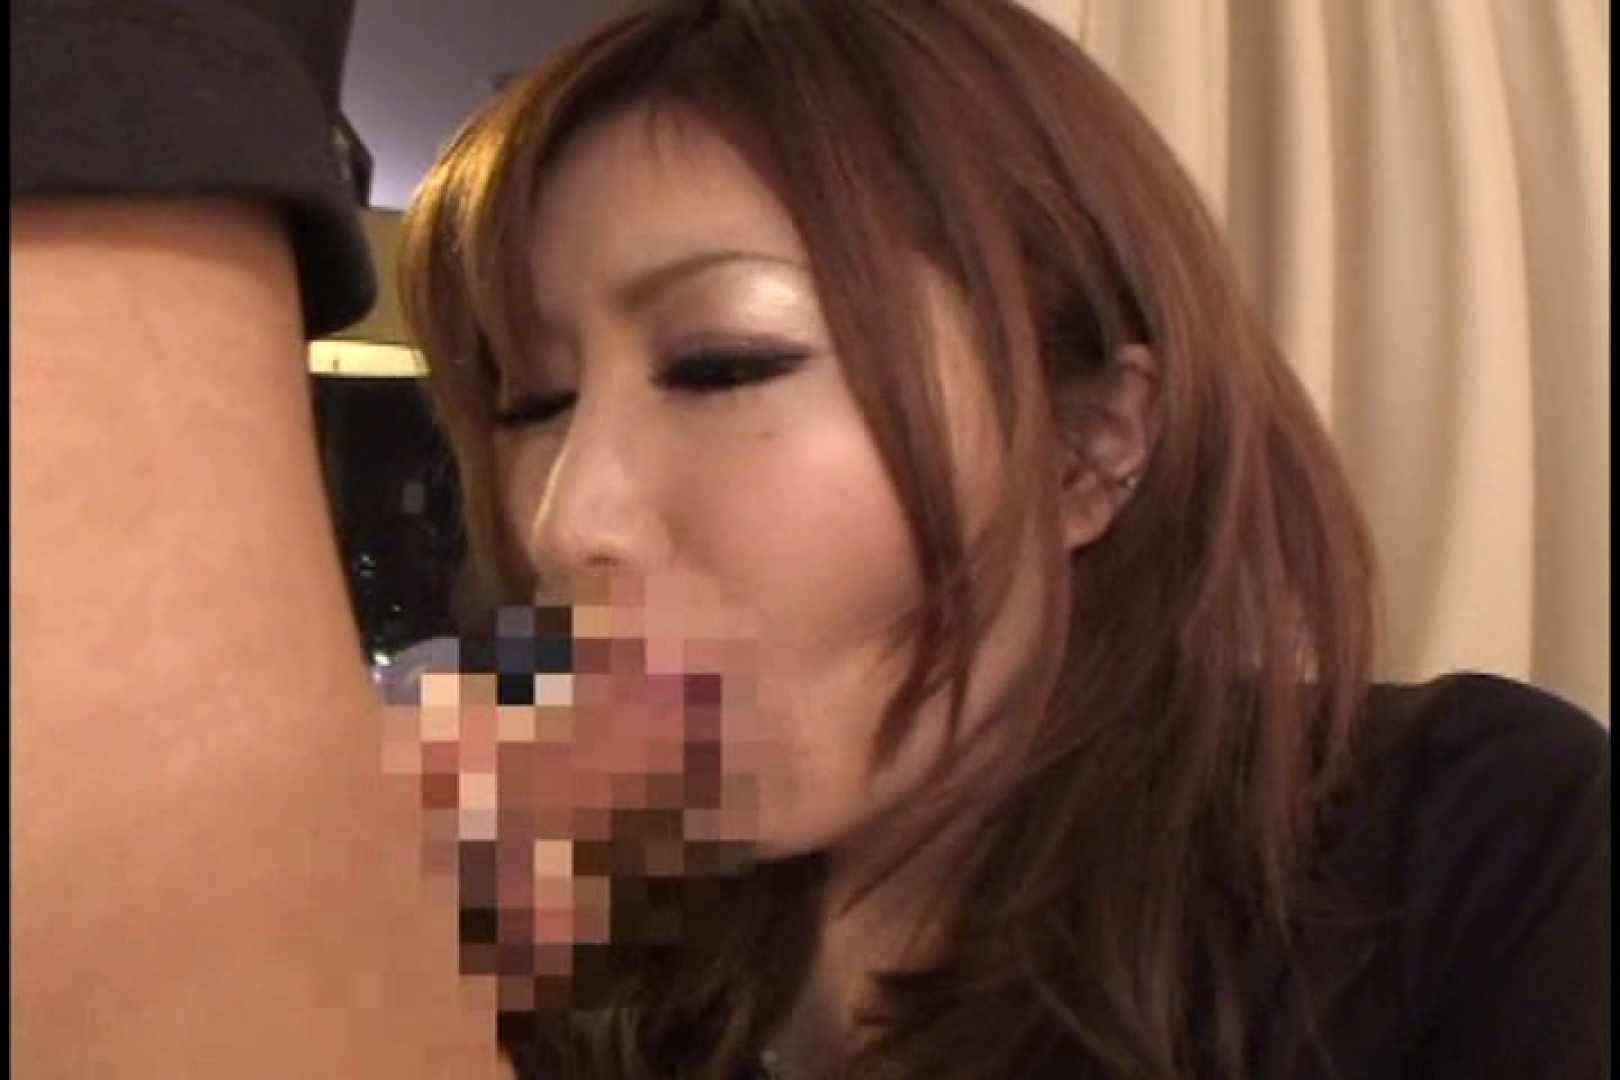 JDハンター全国ツアー vol.042 後編 女子大生のエロ動画  104PIX 38